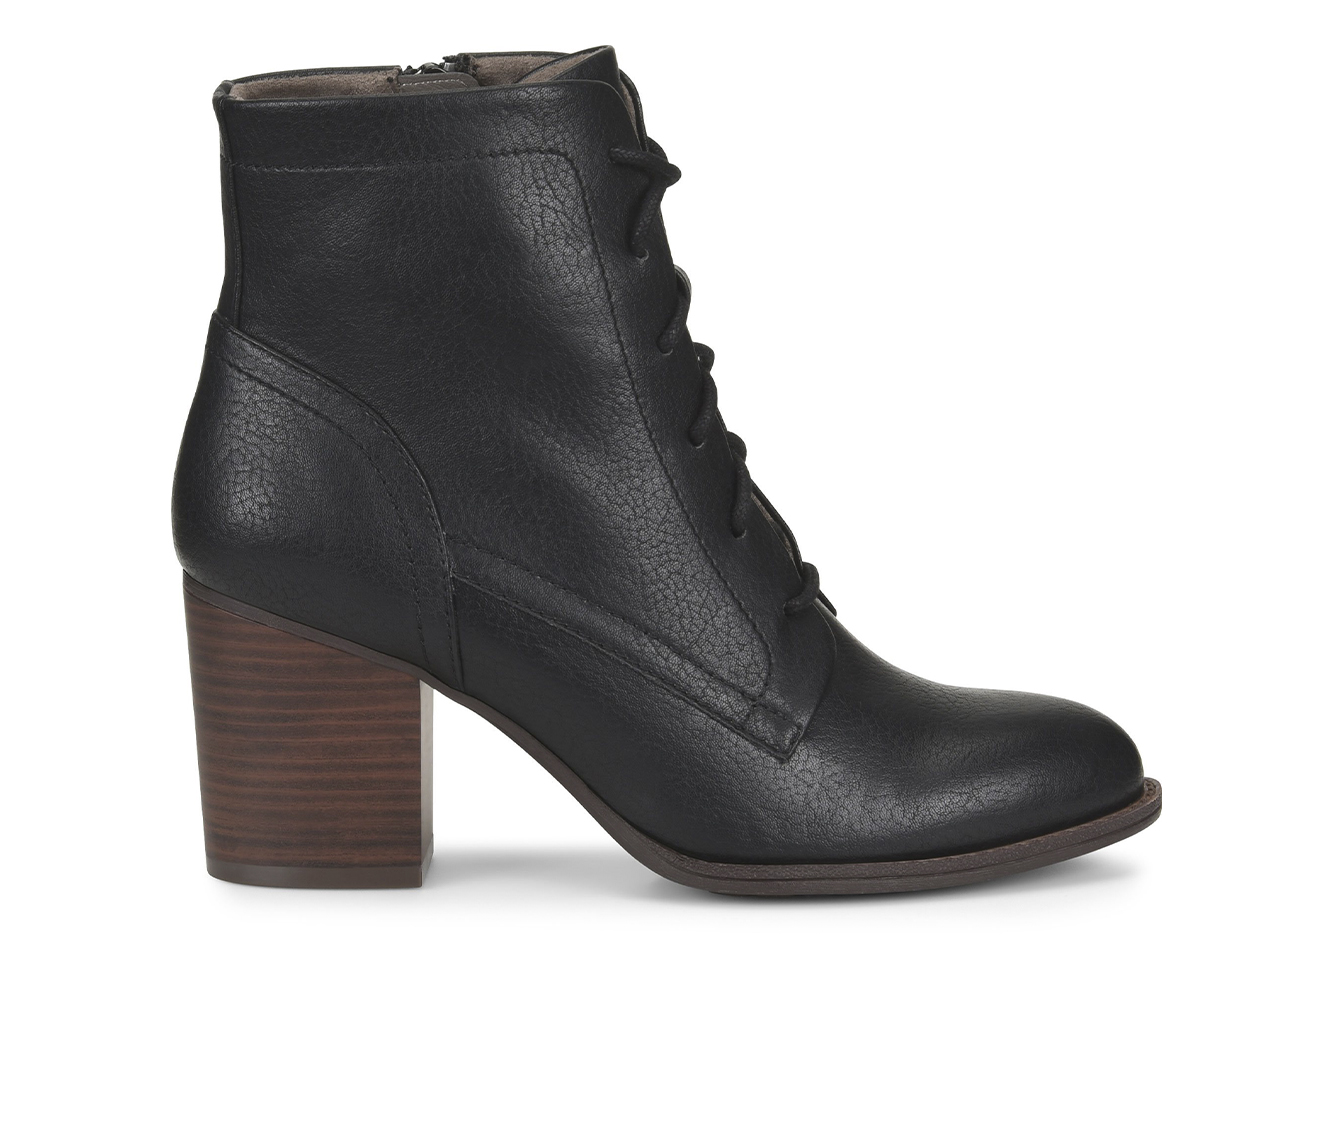 EuroSoft Shawna Women's Boots (Black - Faux Leather)